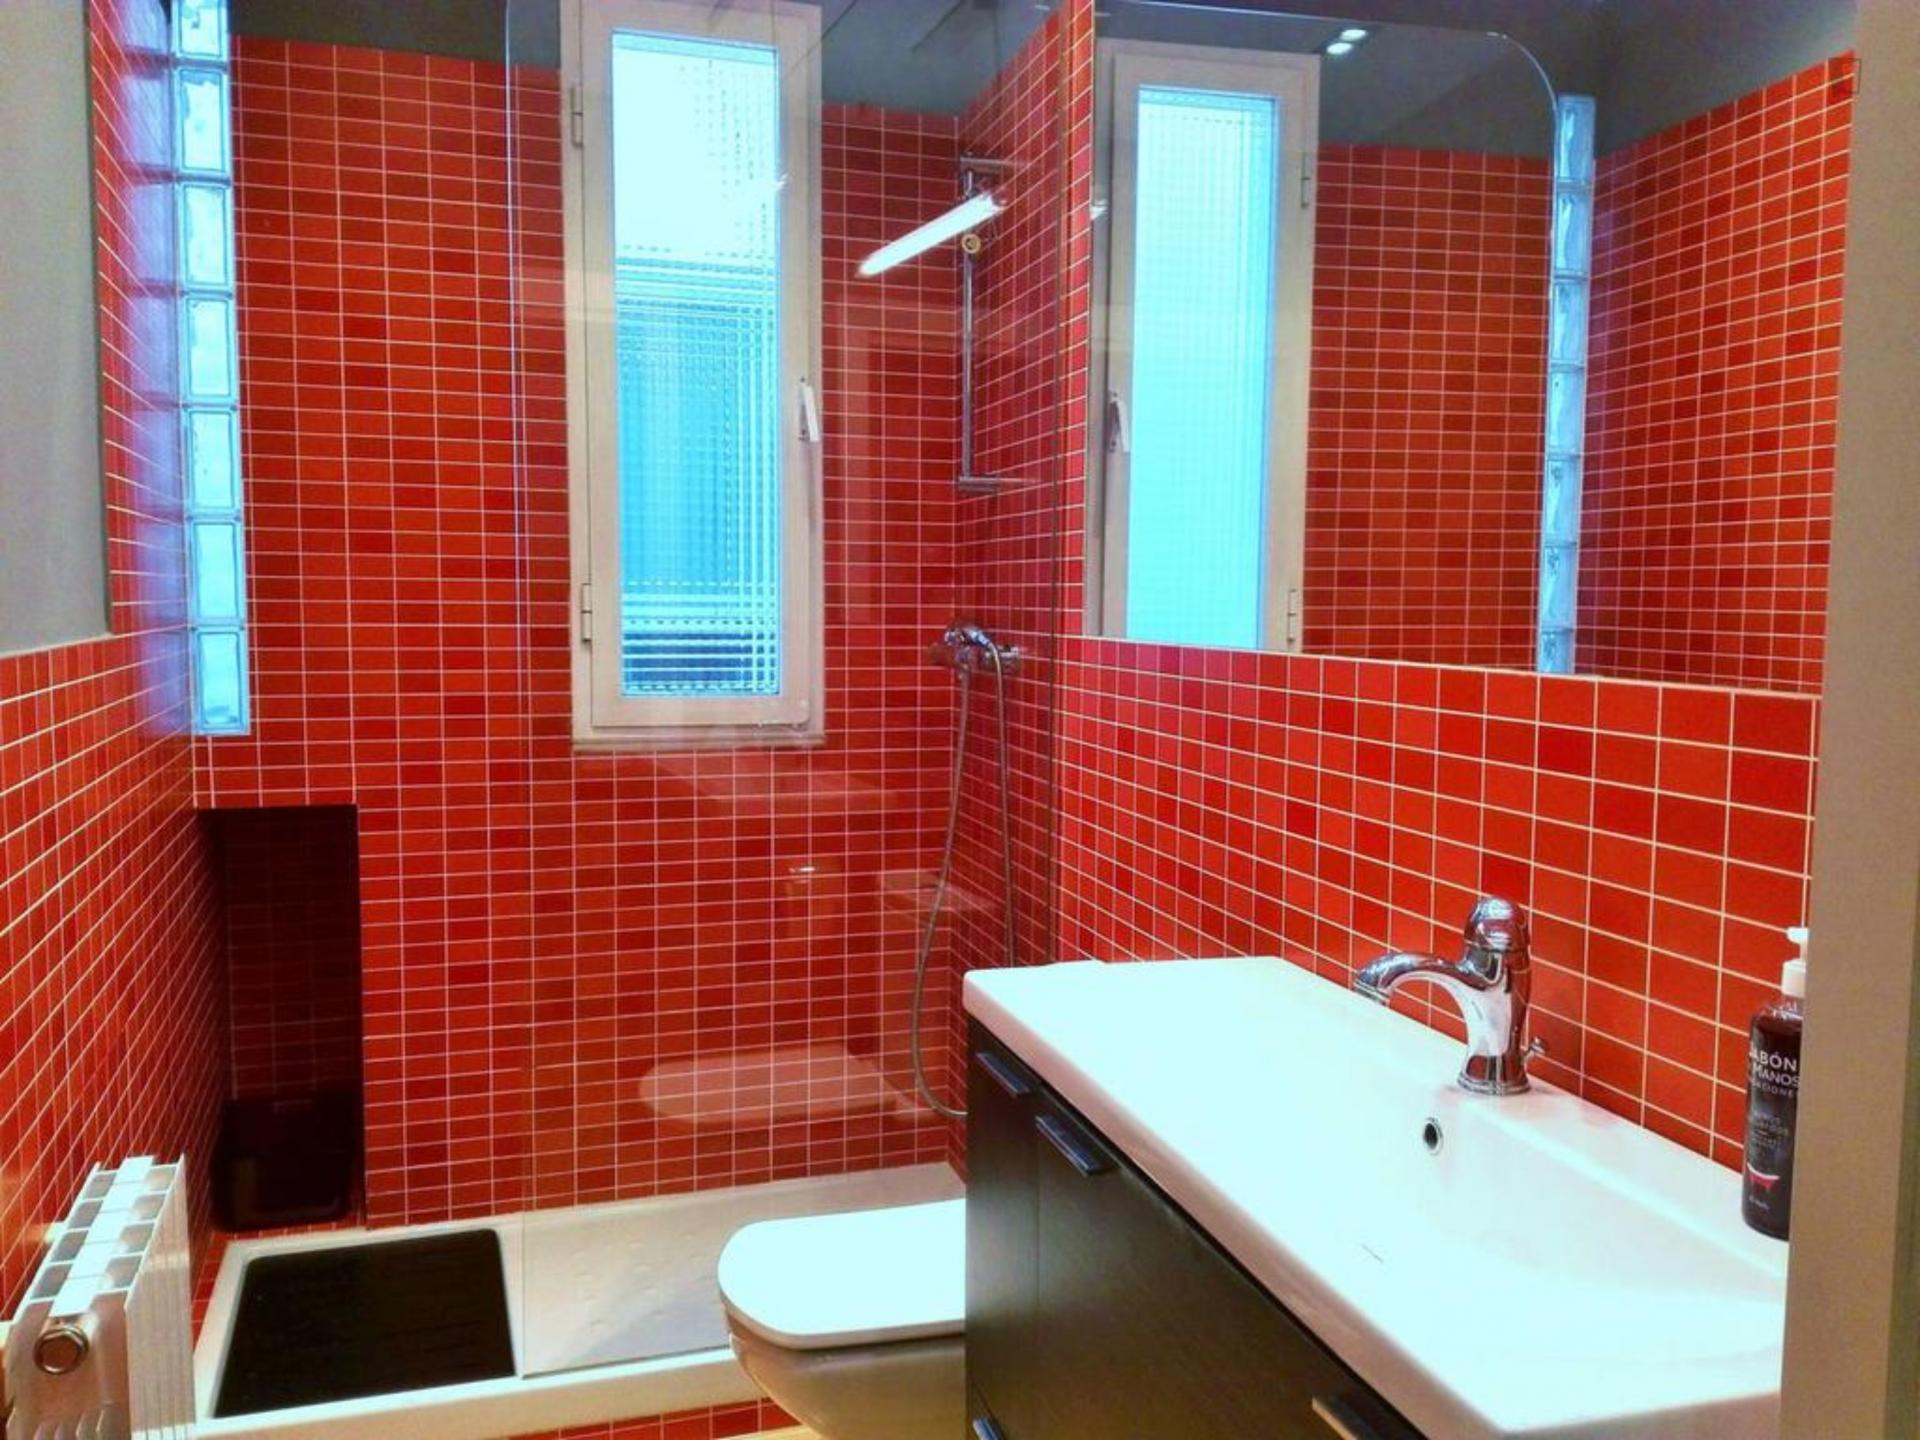 Goienkale - Furnished apartment in Bilbao